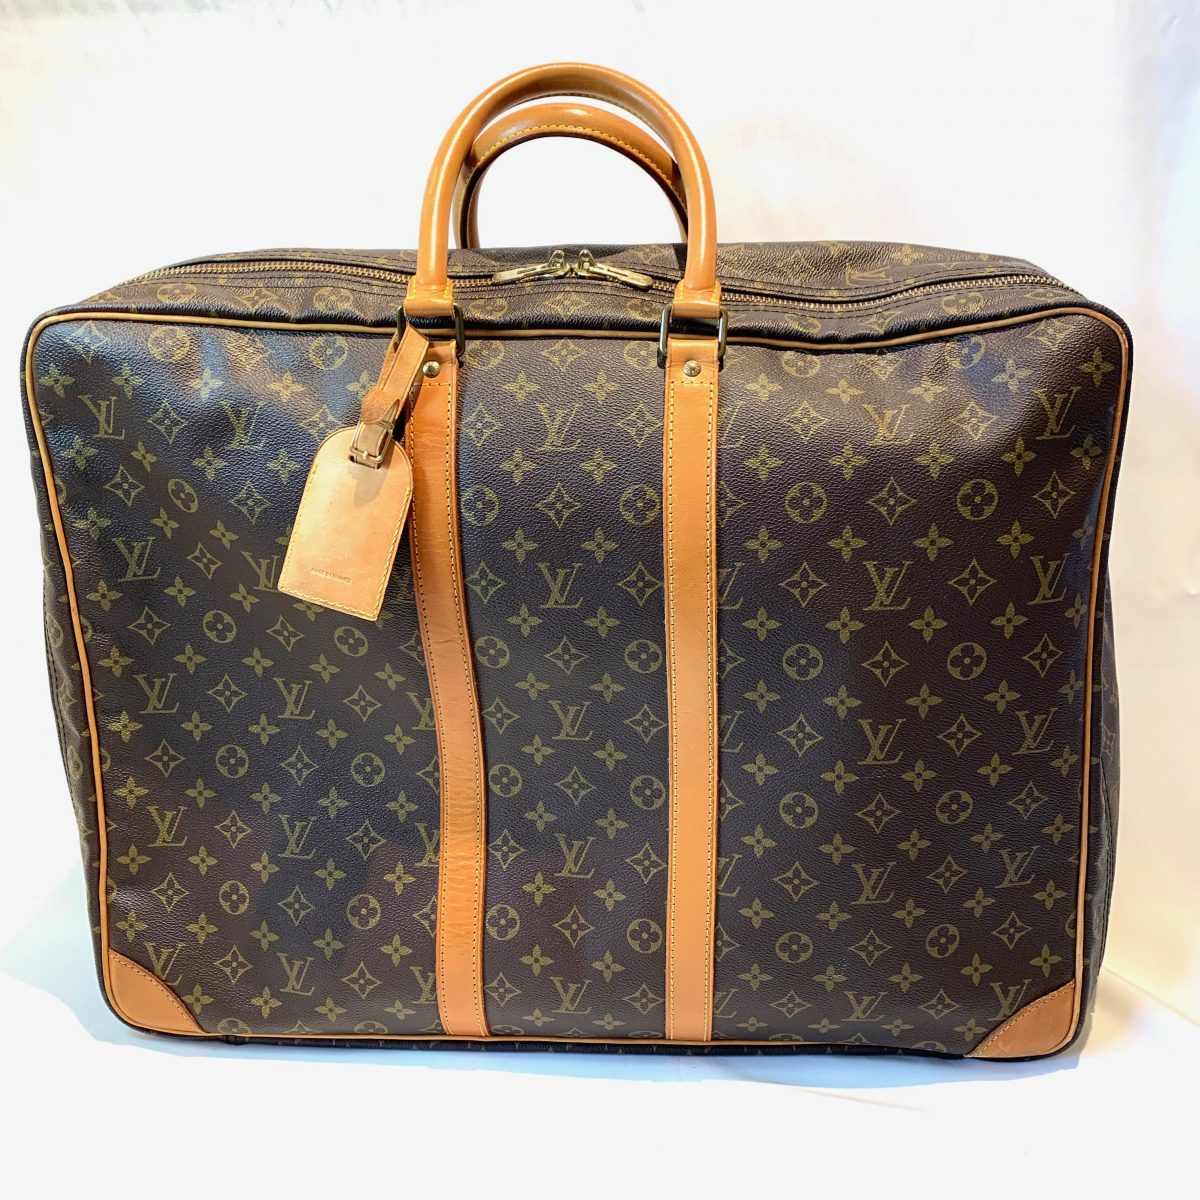 Louis Vuitton Sirius travel suitcase